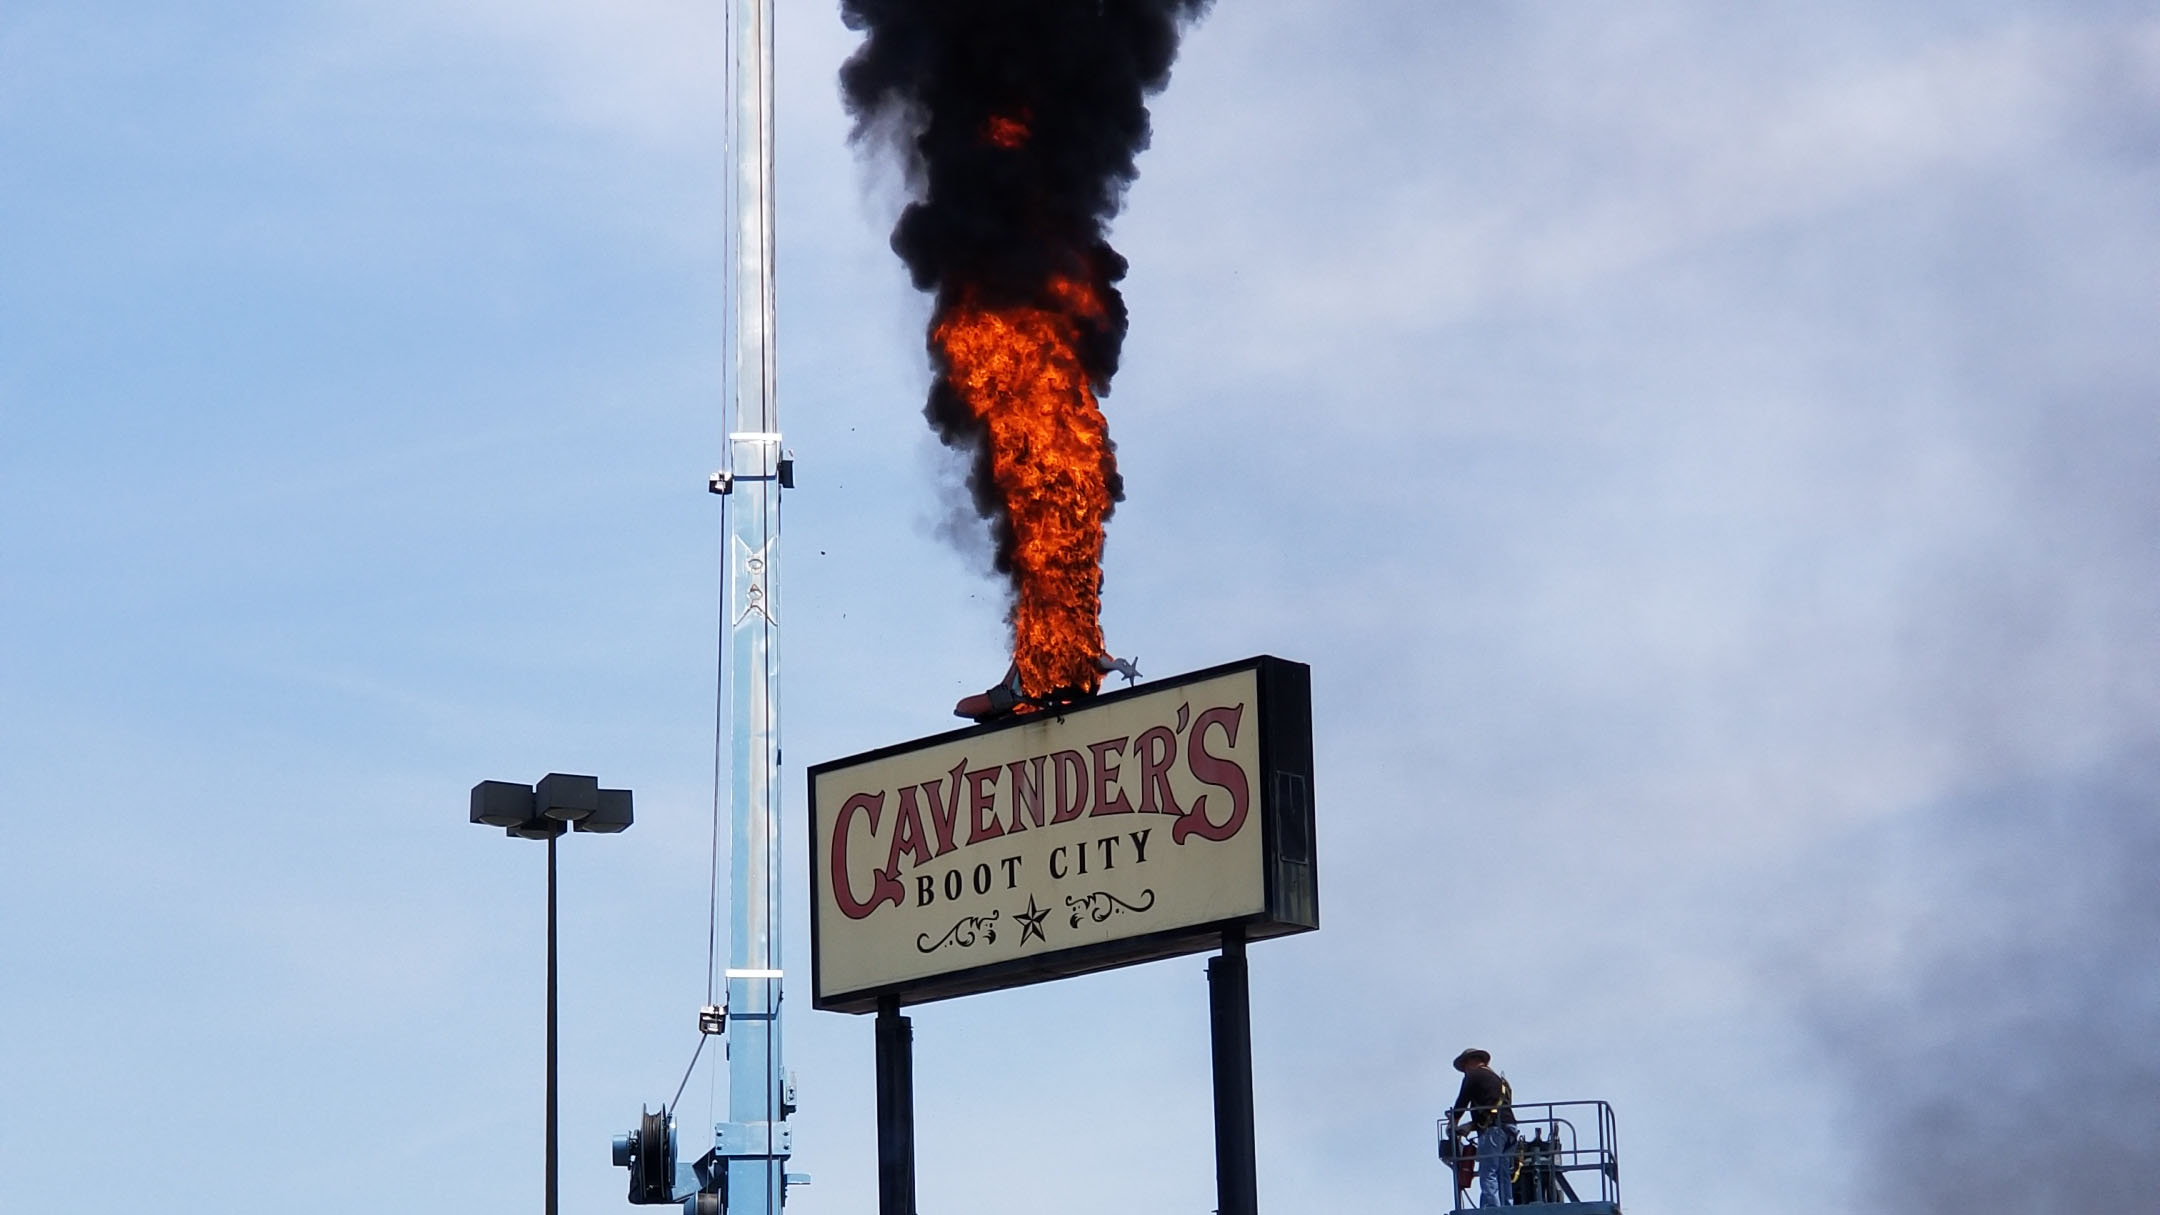 cavender's boot city-846655081